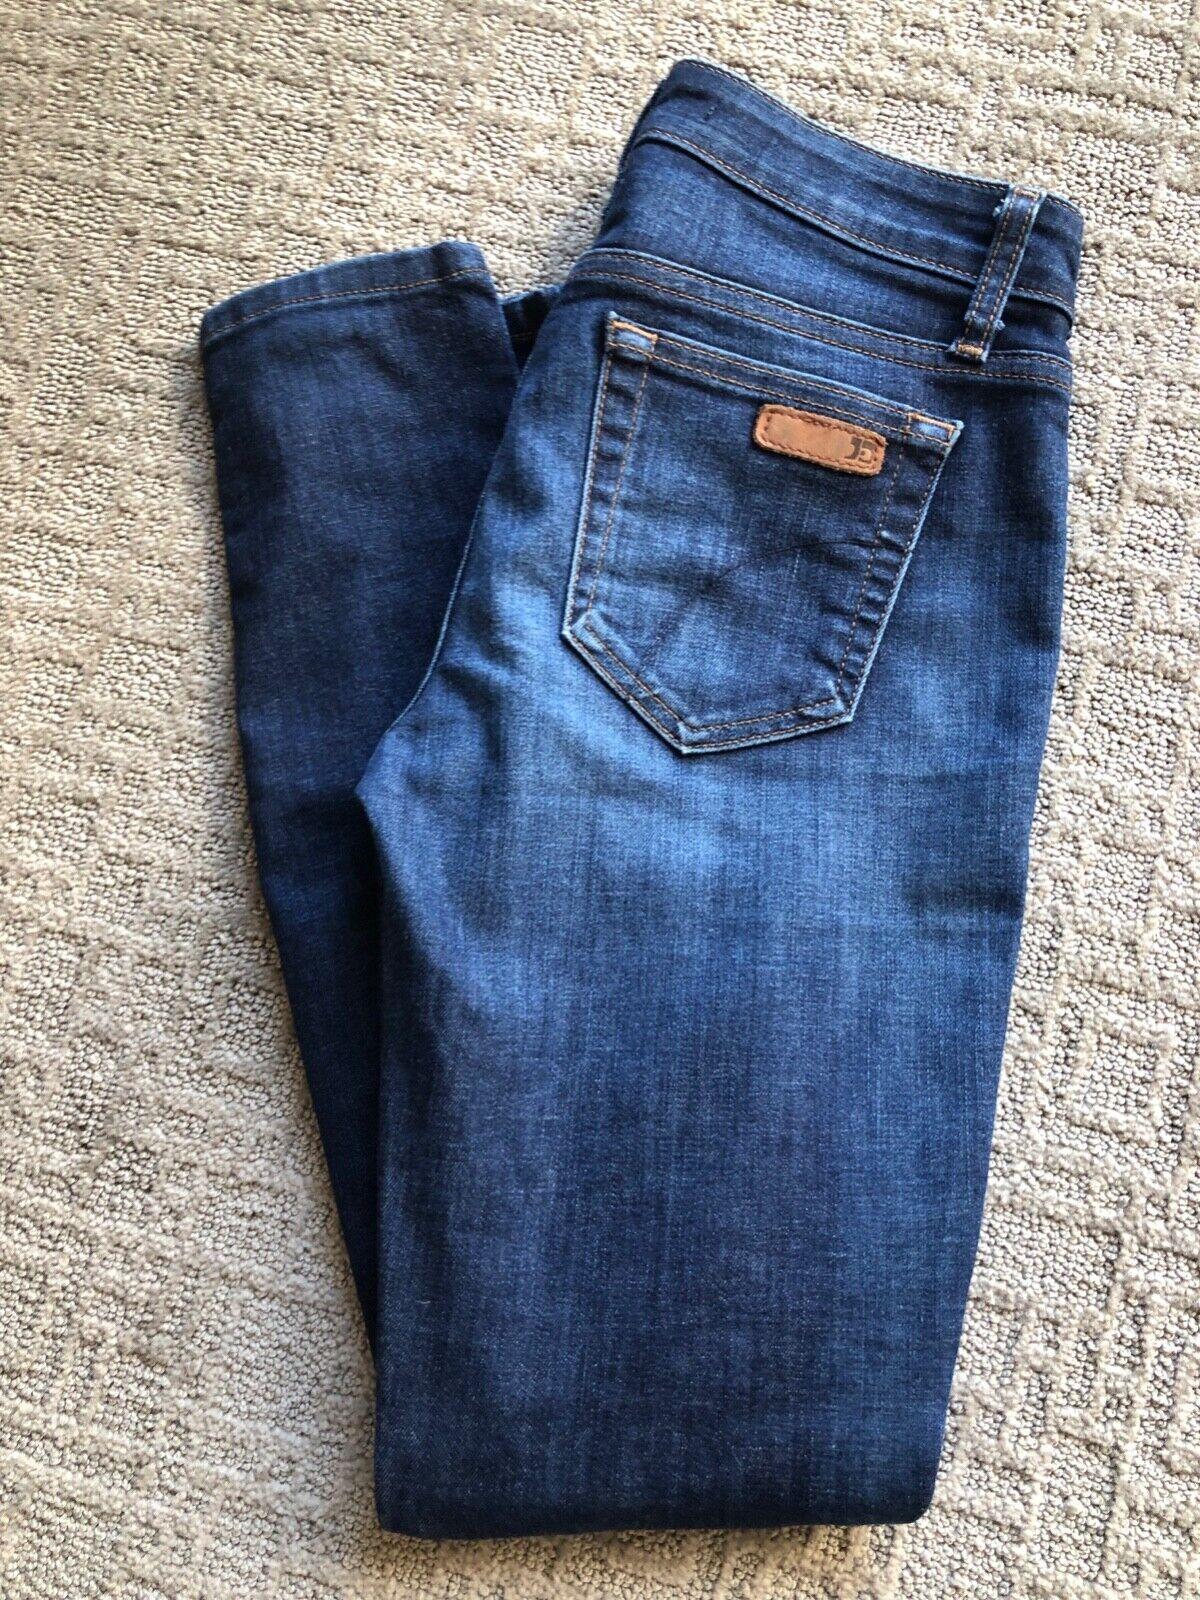 Joe's Jeans Women's Skinny Ankle Jeans, Medium Wash, EUC, Size 25